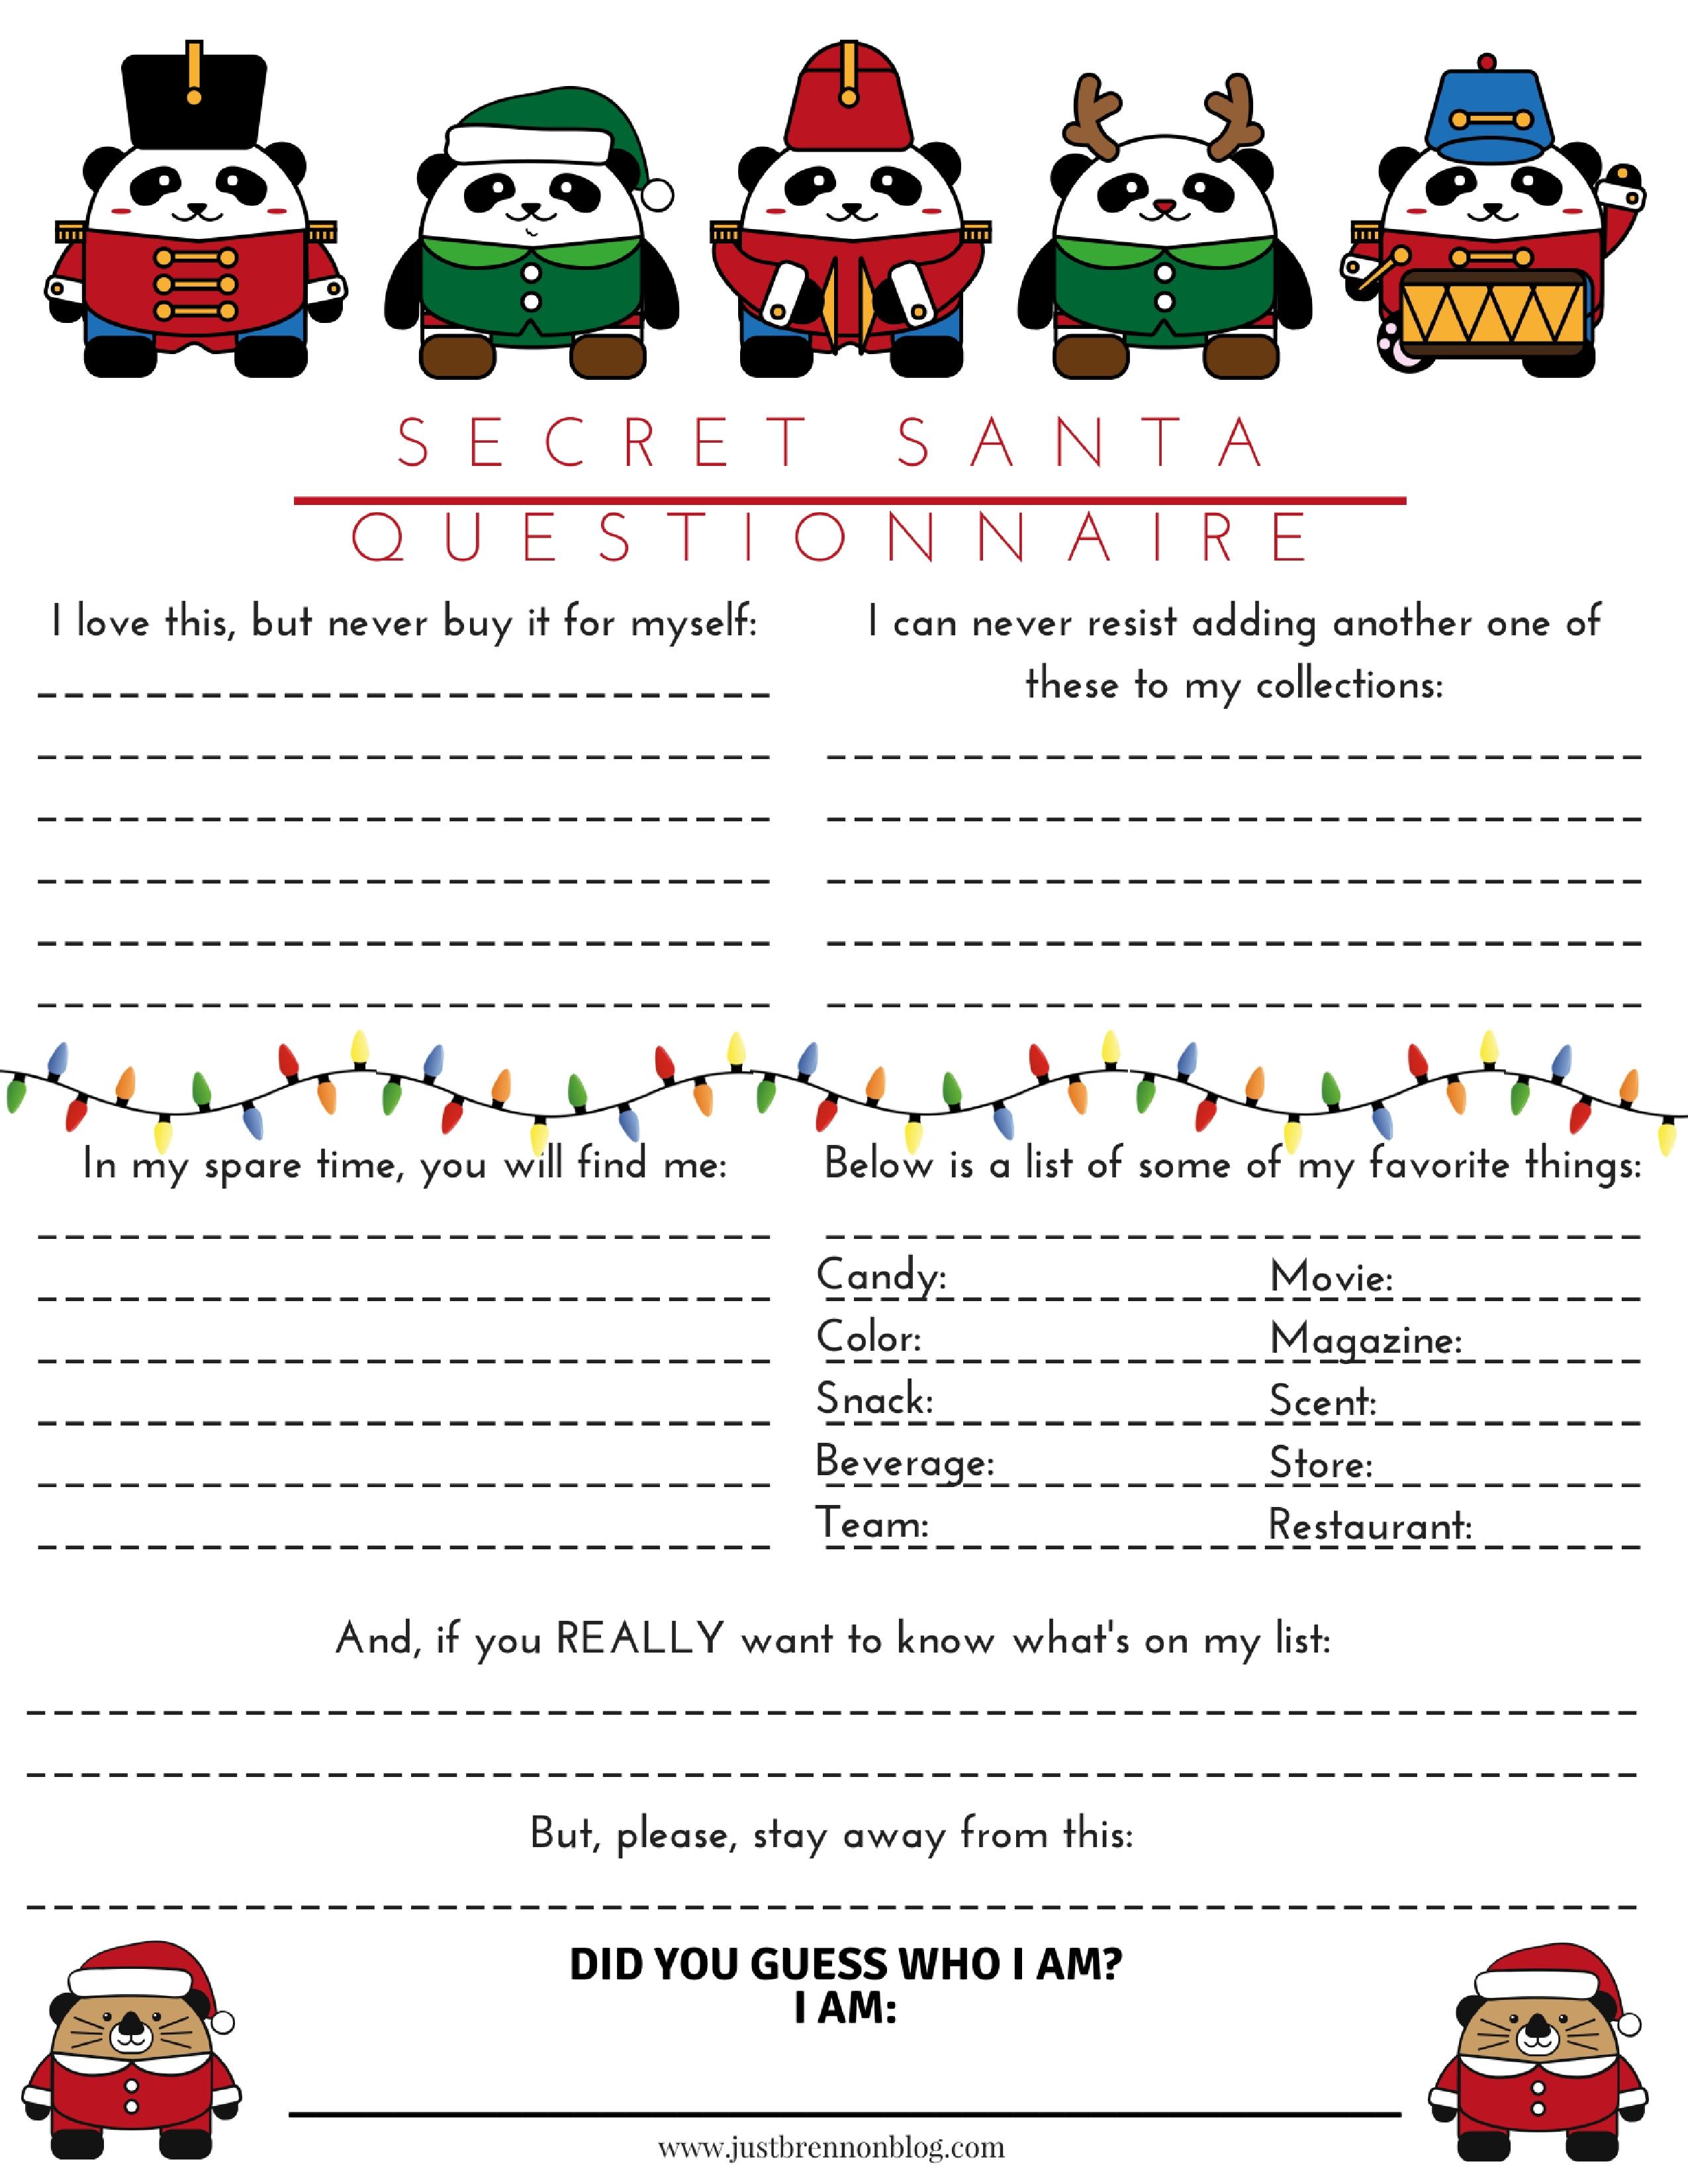 Free Download Secret Santa Questionnaire Just Brennon